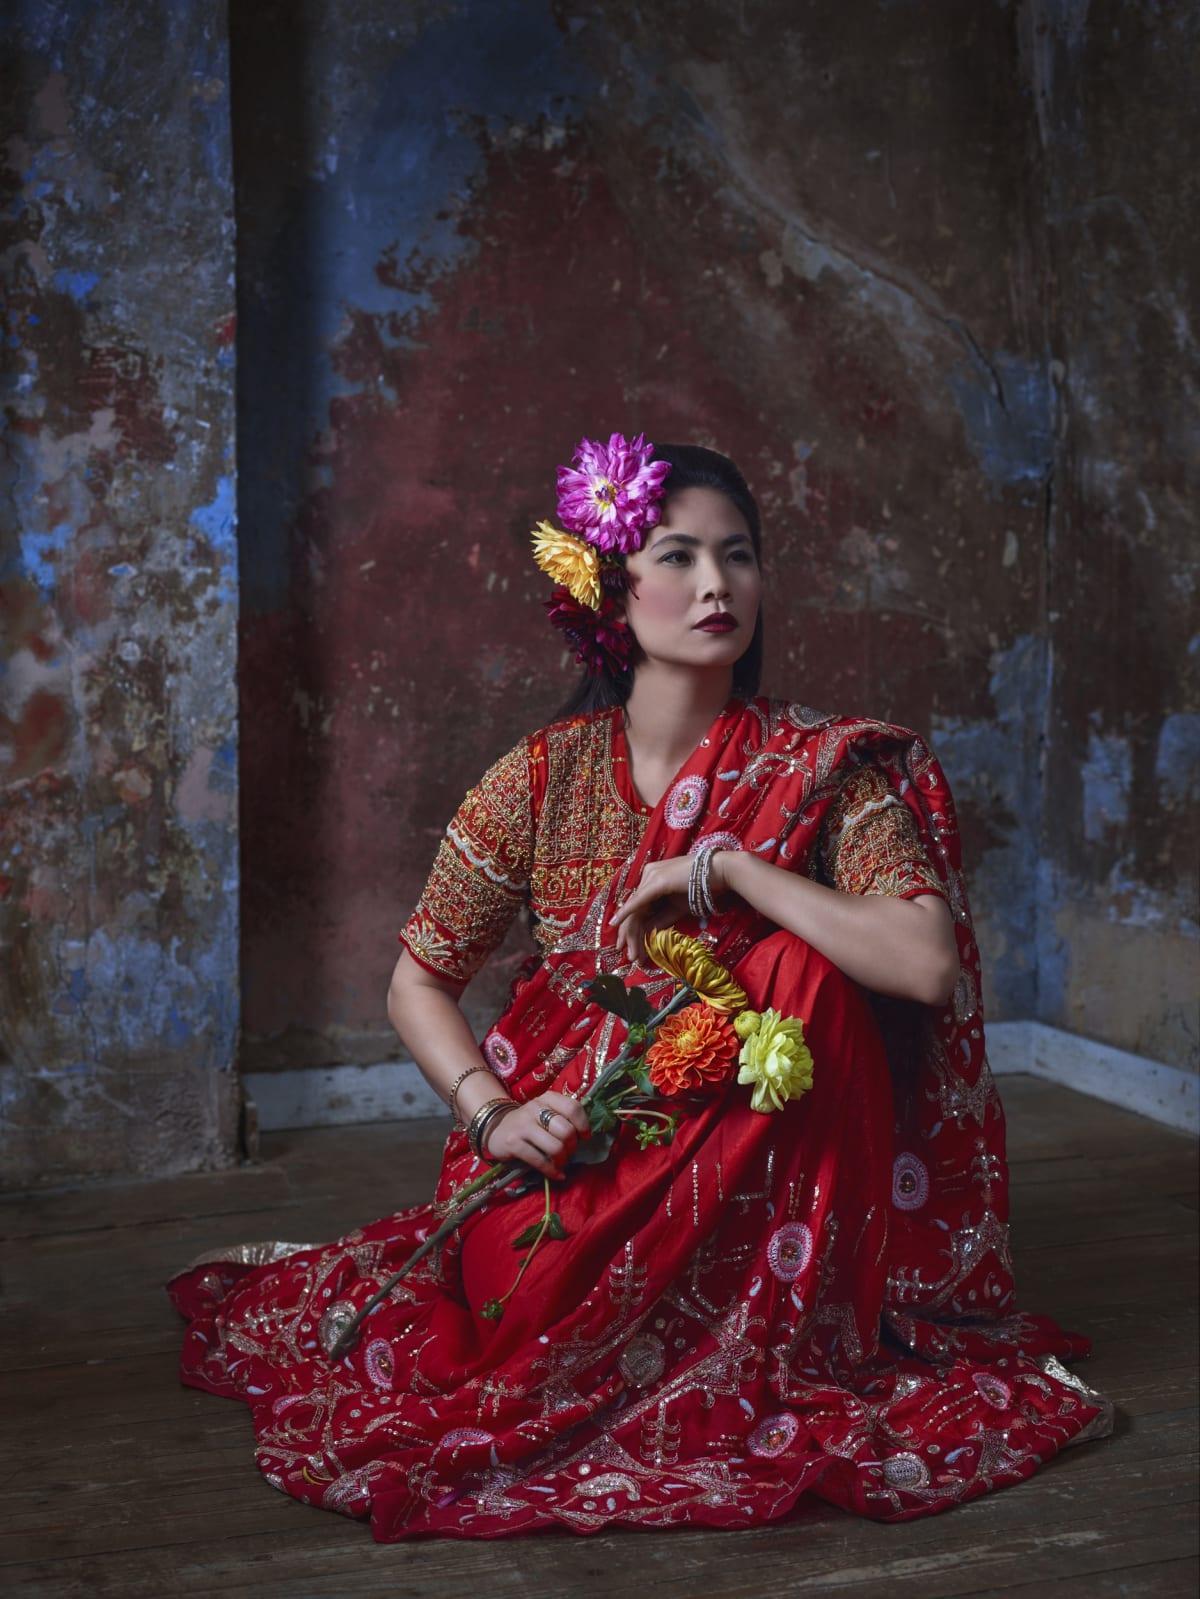 Asianwoman Flower Head 3 Lr